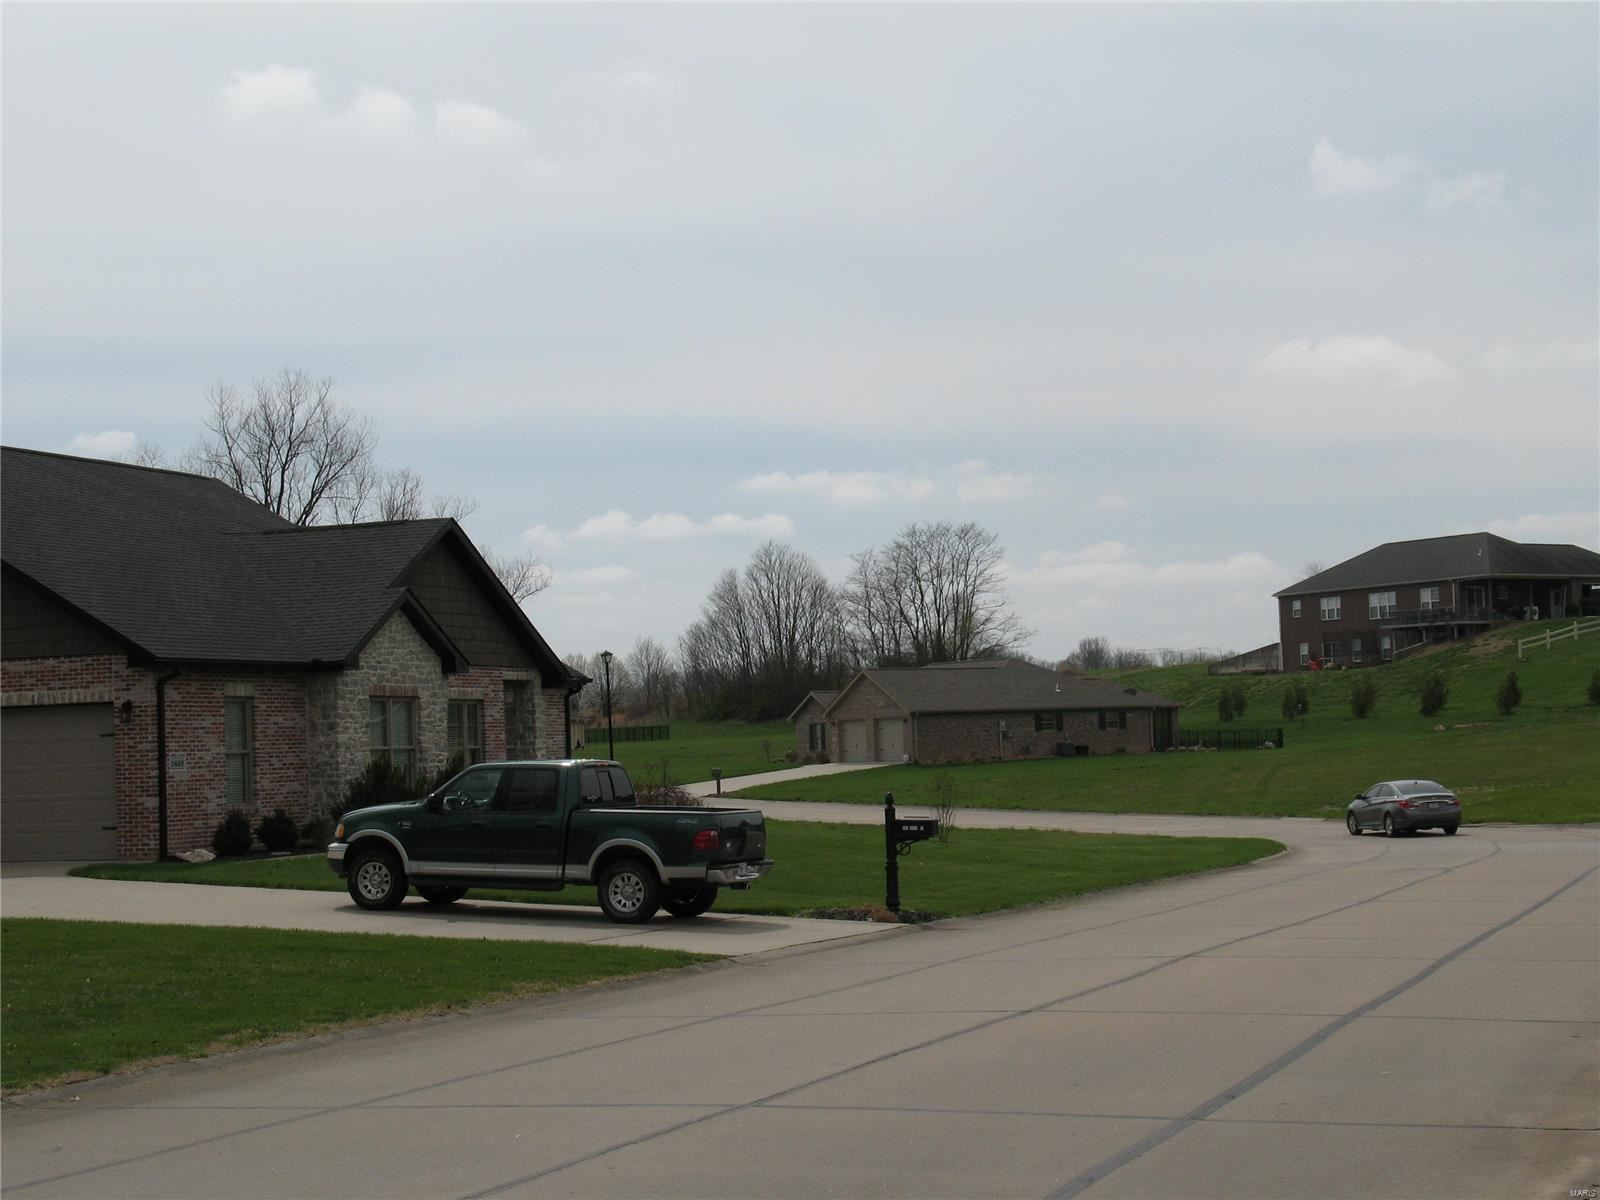 Photo of 1636 Mohawk #32, Jackson, MO 63755 (MLS # 21042280)